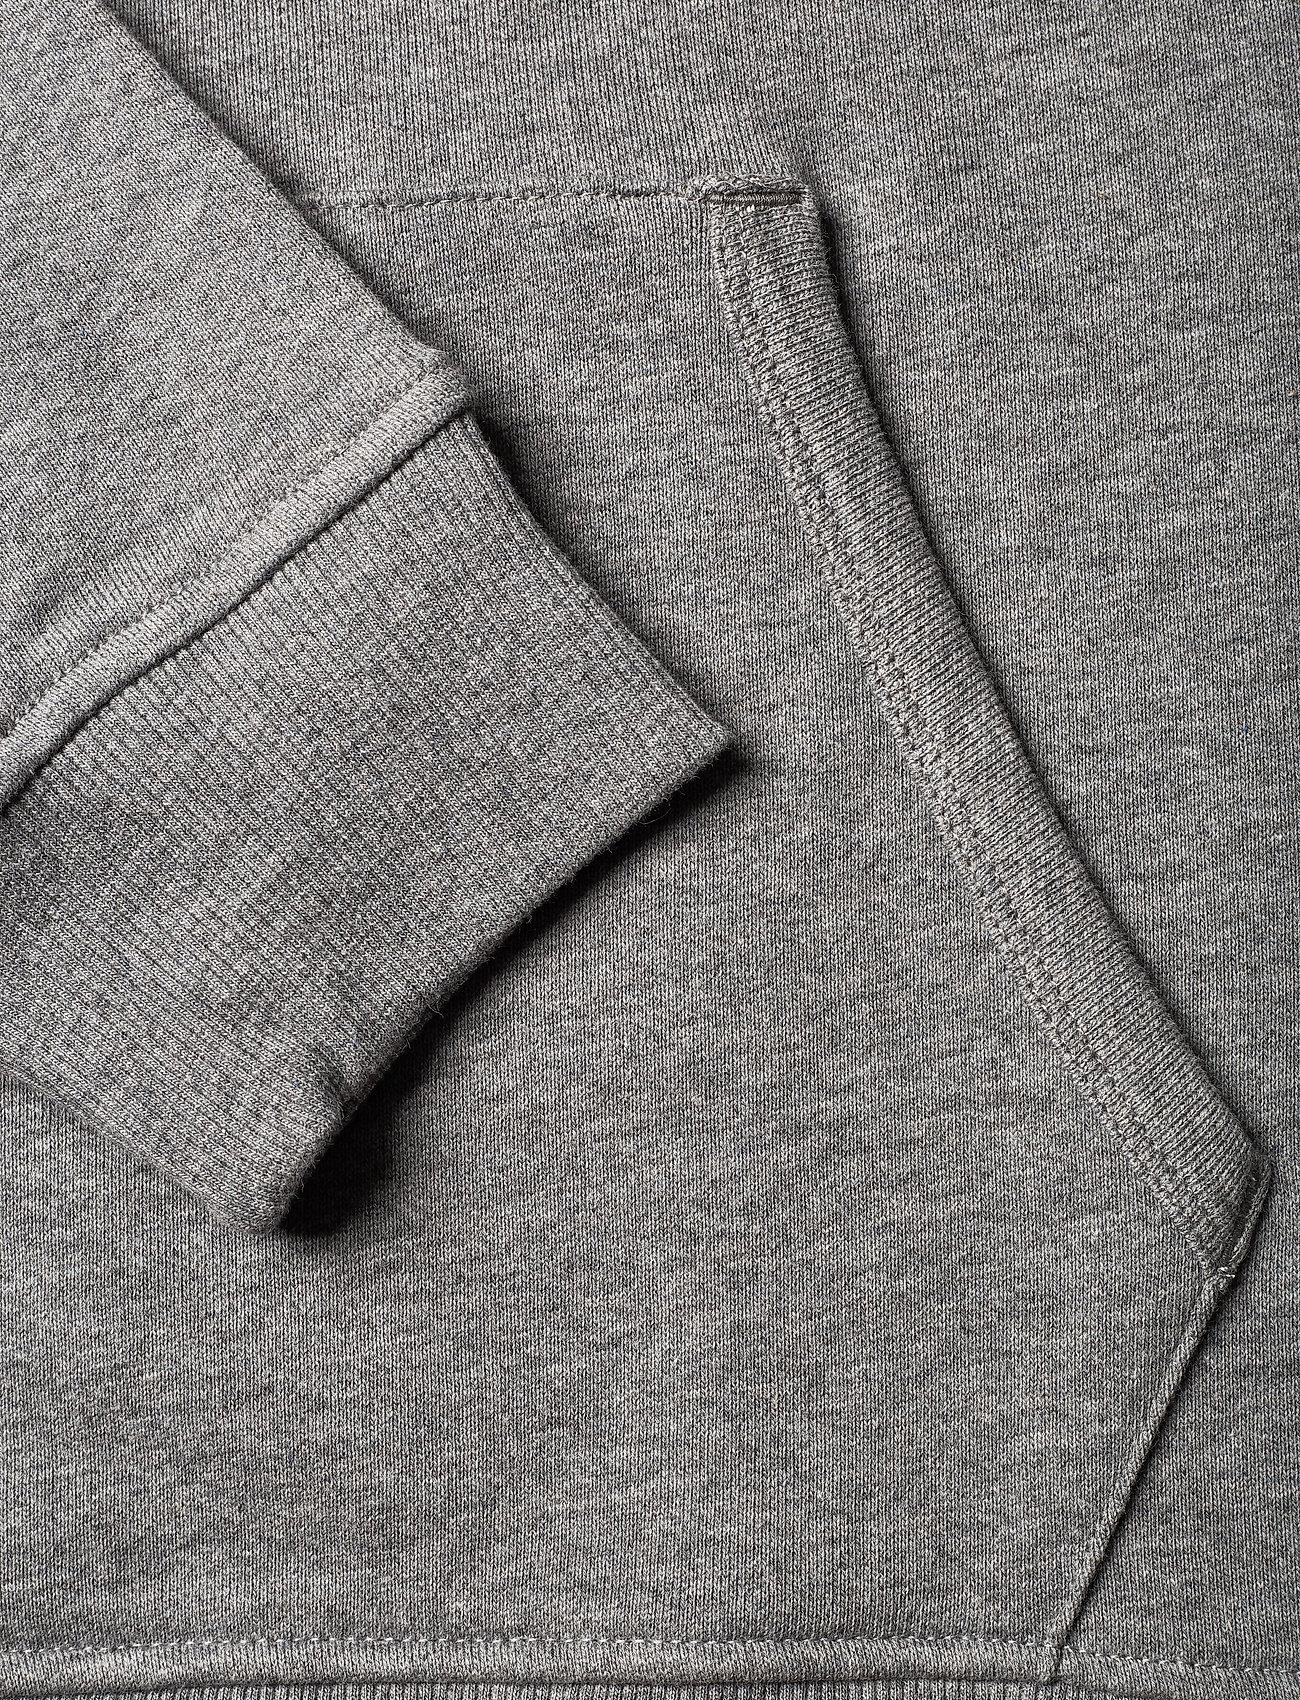 Lyle & Scott Pullover Hoodie - Sweatshirts MID GREY MARL - Menn Klær